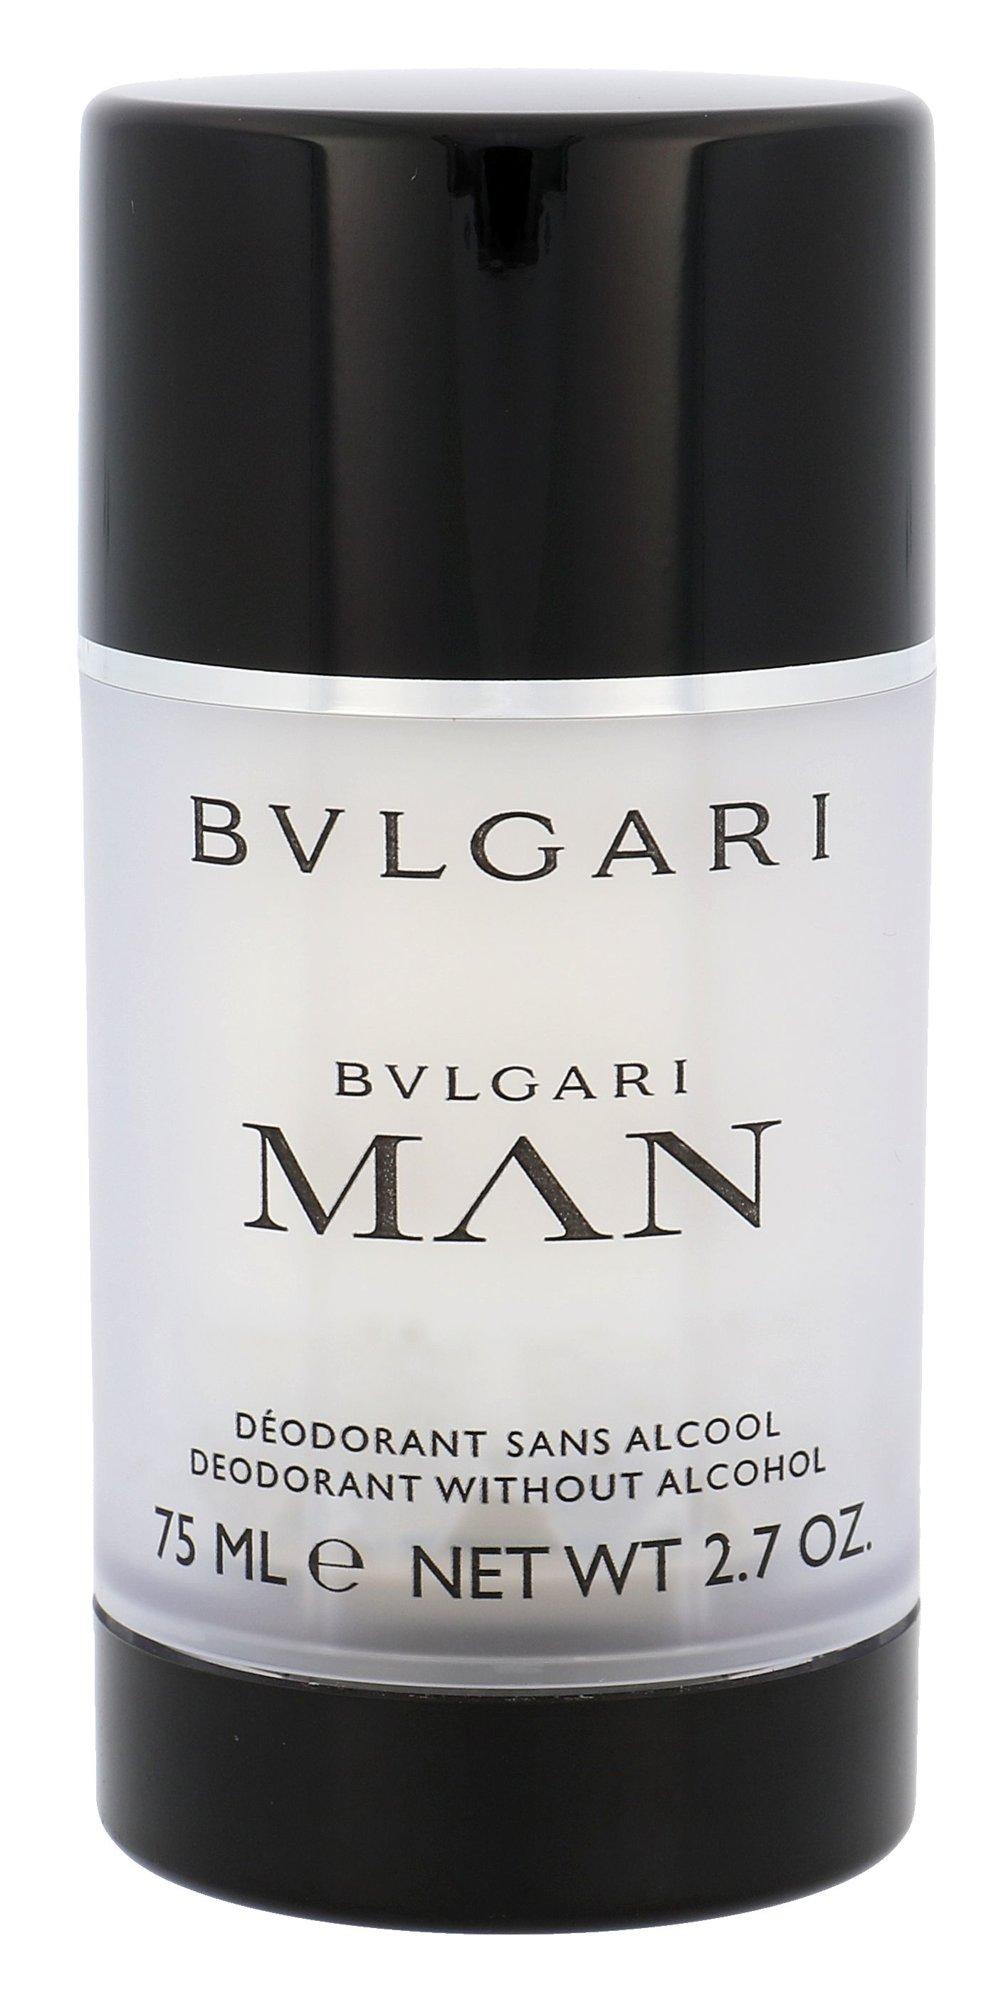 Bvlgari Bvlgari Man Deostick 75ml